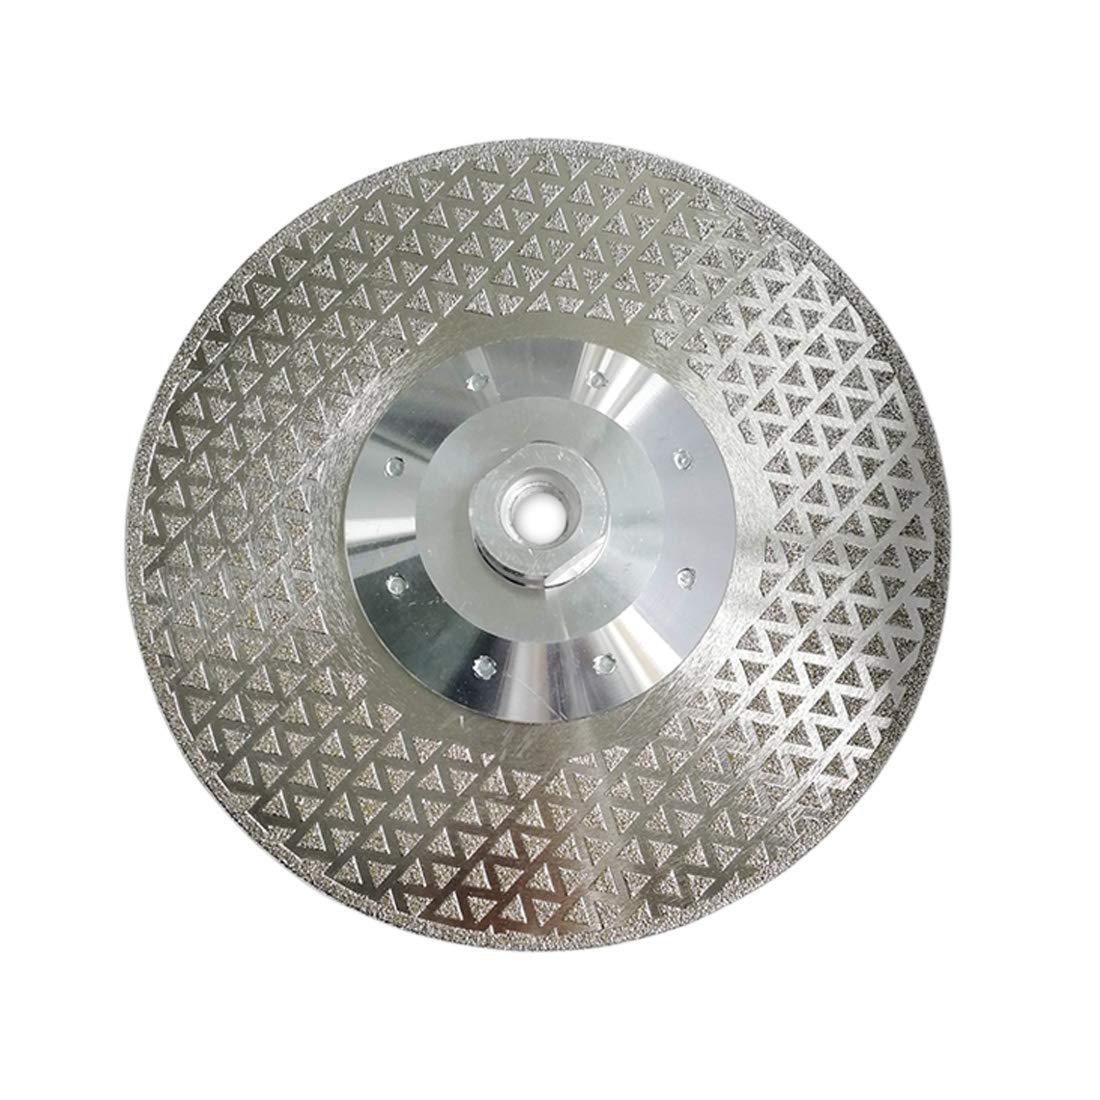 SHDIATOOL Disco Diamante 105mm Hoja de Sierra Estrecha Turbo con Brida M14 para Porcelana Loseta Cer/ámico Granito M/ármol